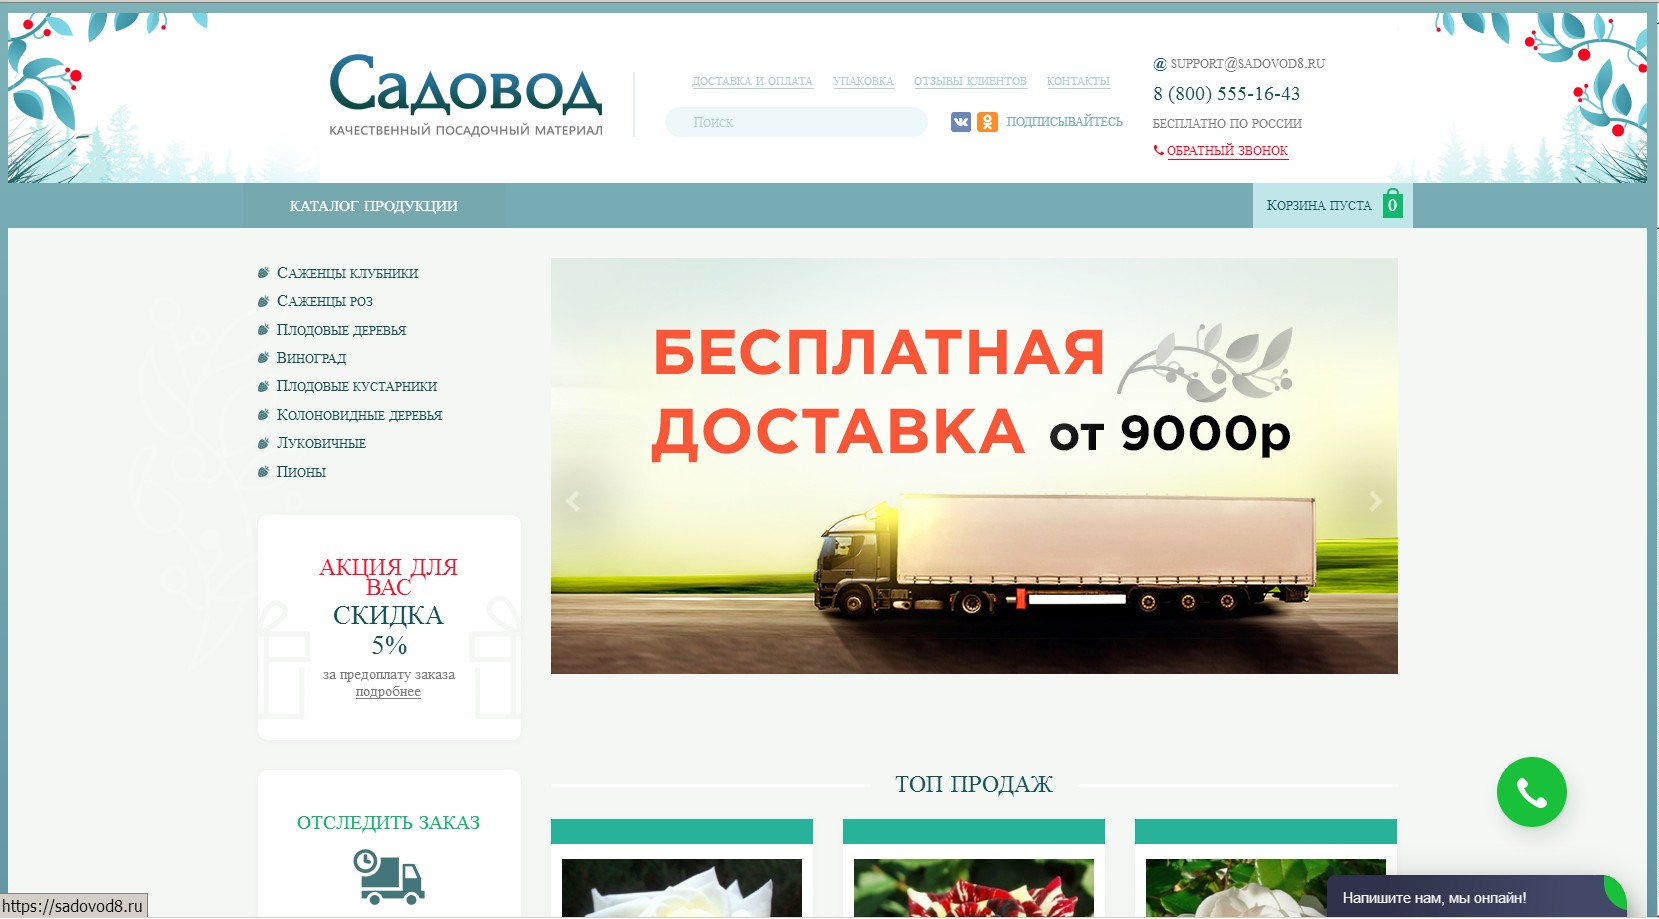 логотип sadovod8.ru